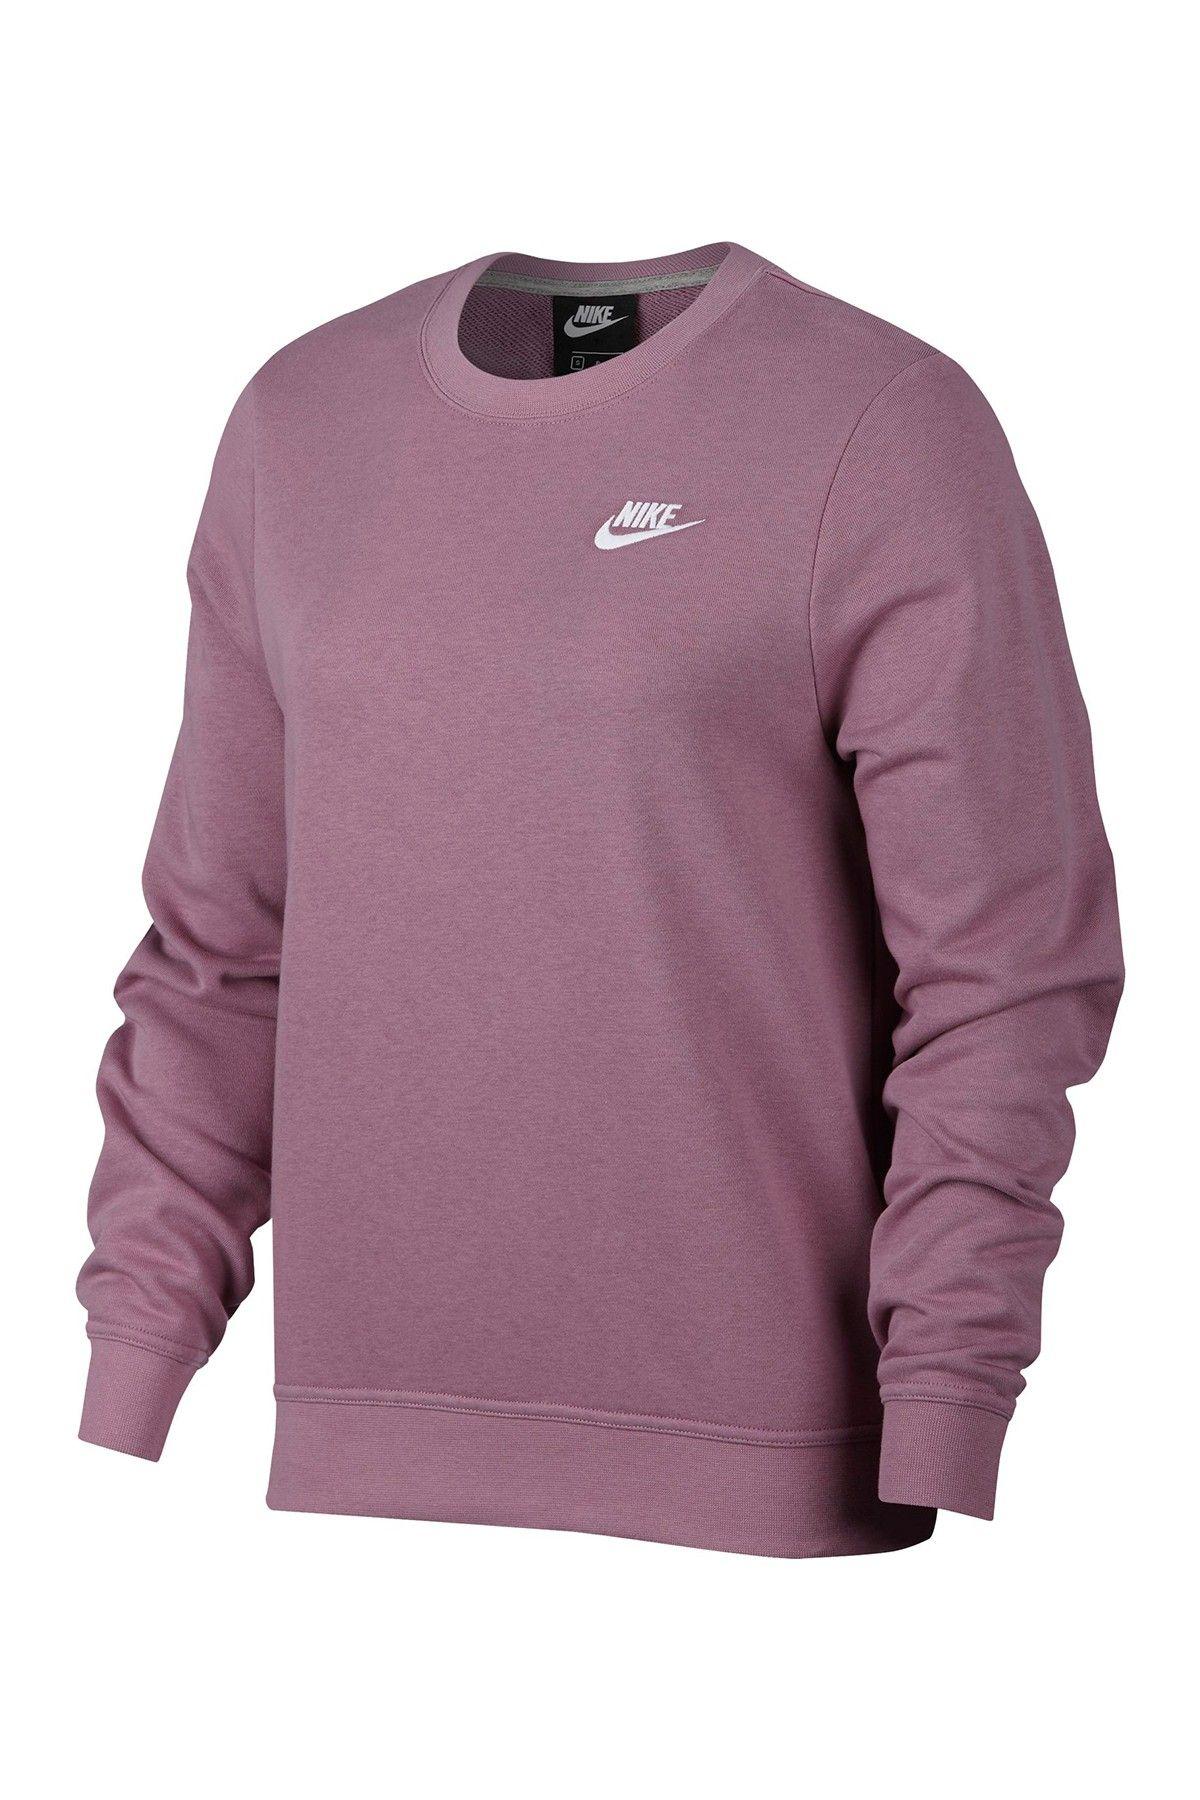 Nike Club Crew Neck Sweater Nordstrom Rack Crewneck Sweatshirt Outfit Crewneck Sweatshirt Women Sweatshirt Outfit [ 1800 x 1200 Pixel ]